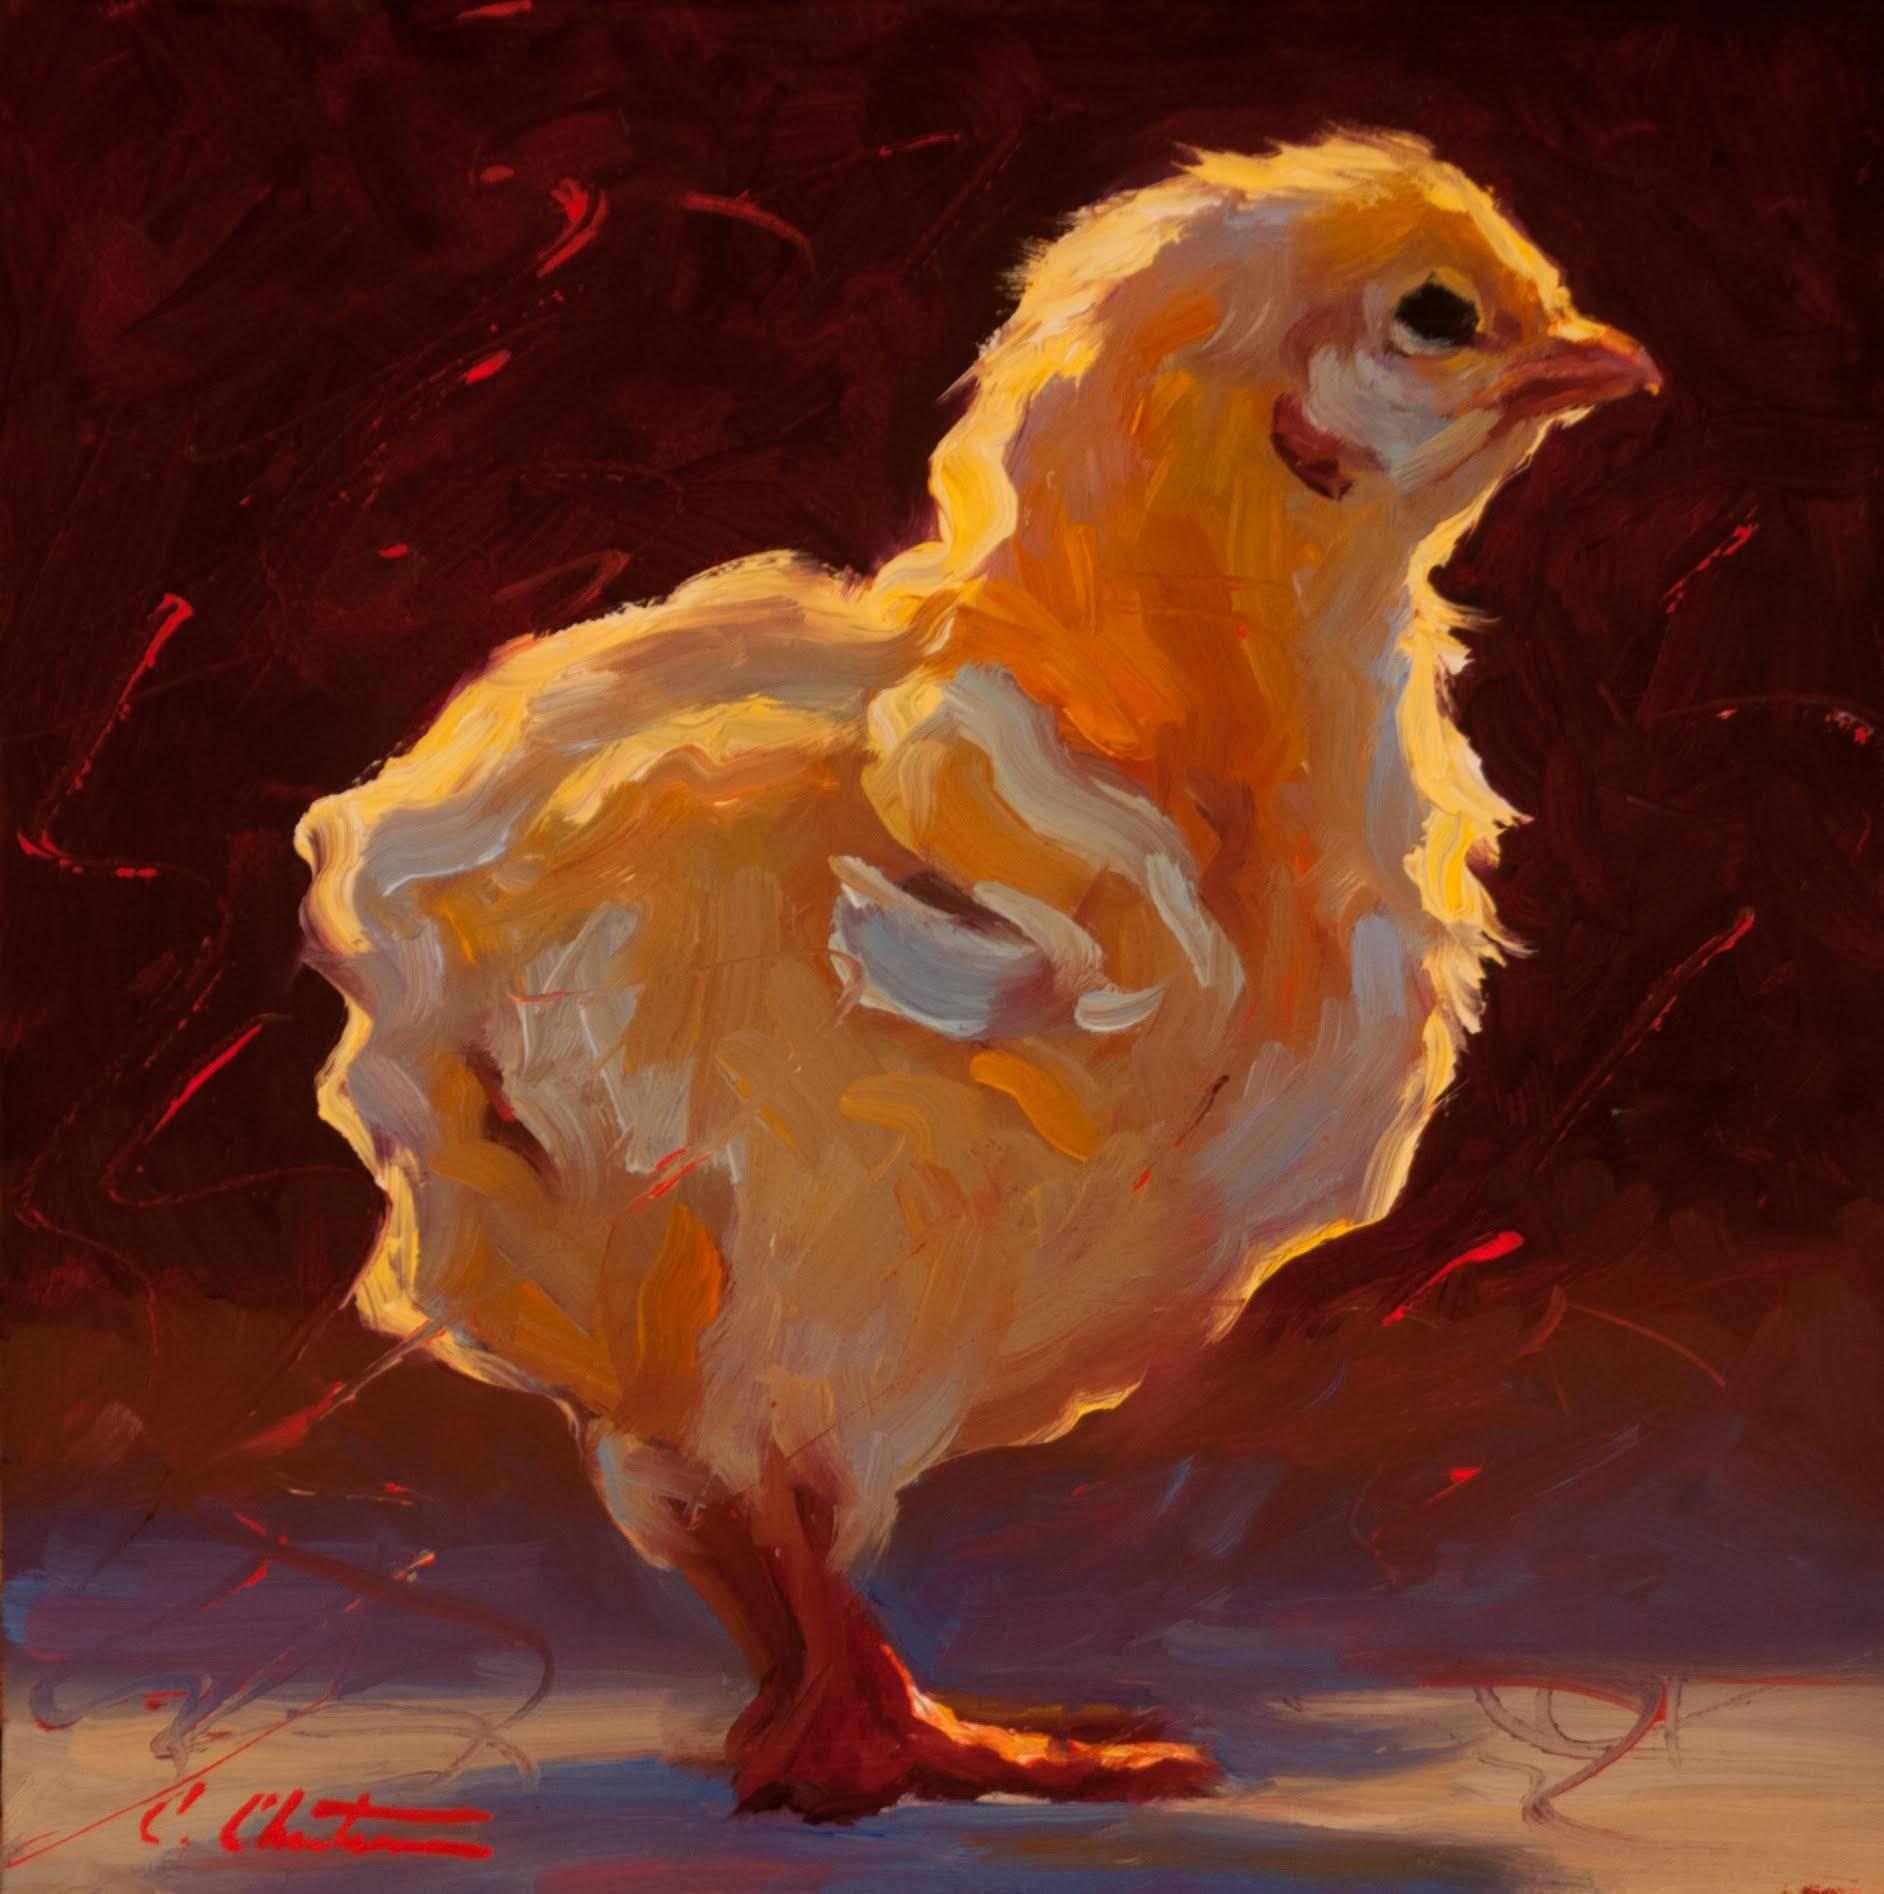 """Contemplative Chick"" Painterly Chick in Bright Yellows, Dark Purple Background"